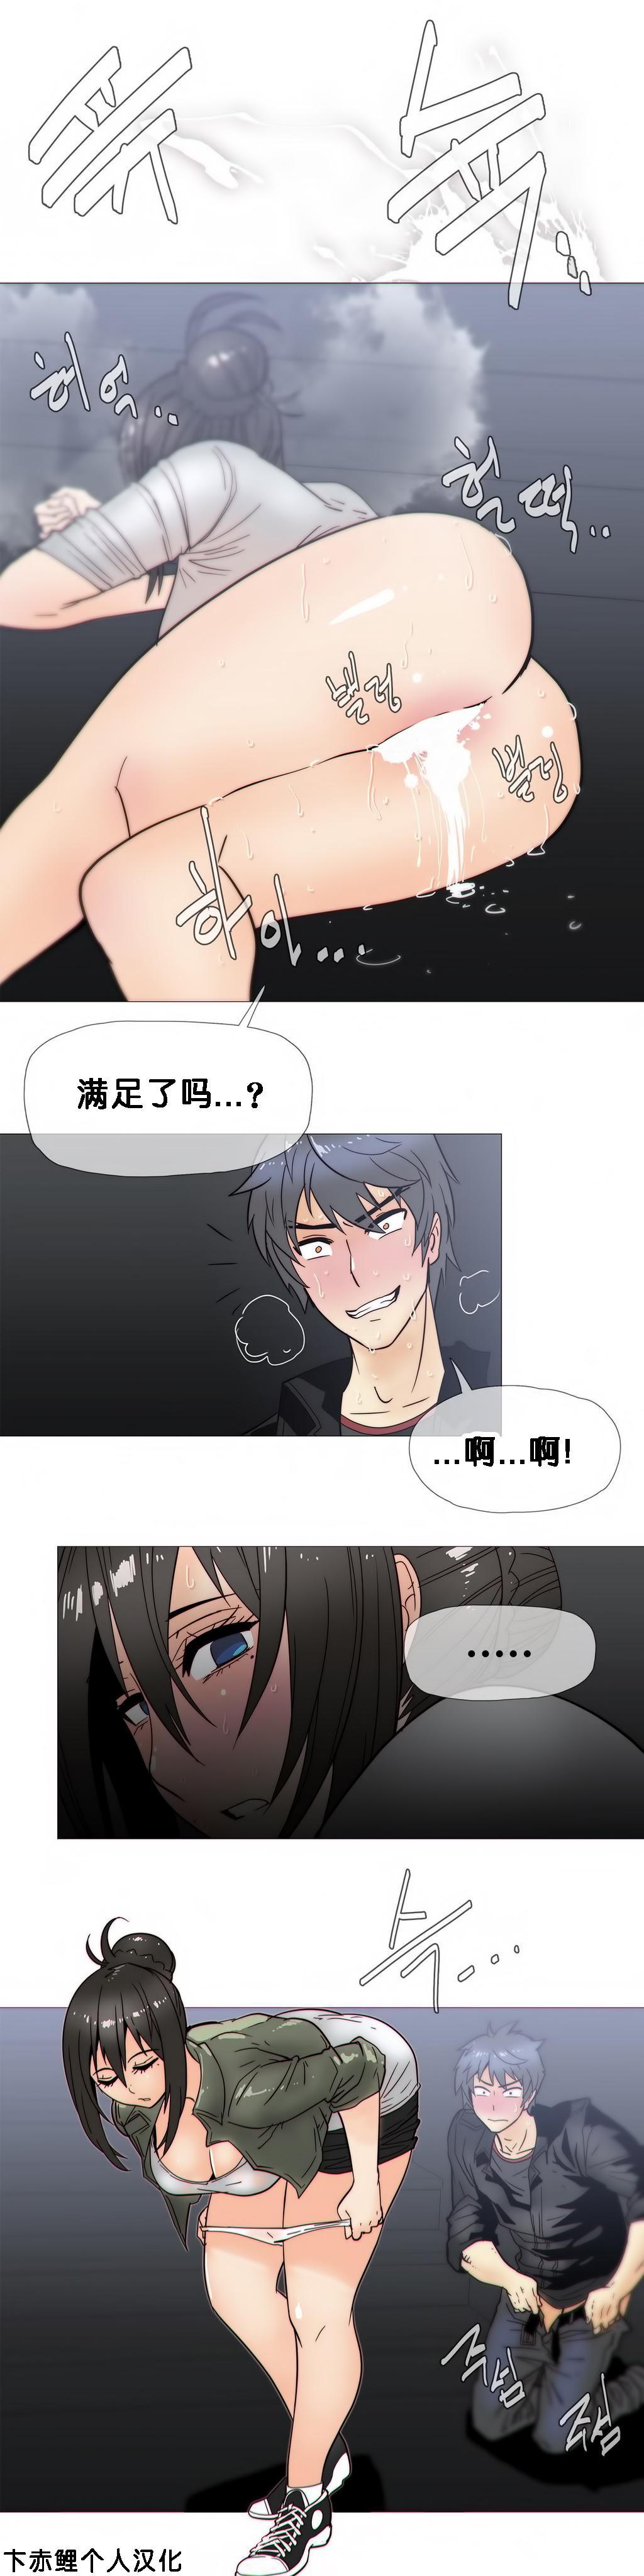 HouseHold Affairs 【卞赤鲤个人汉化】1~21话(持续更新中) 488